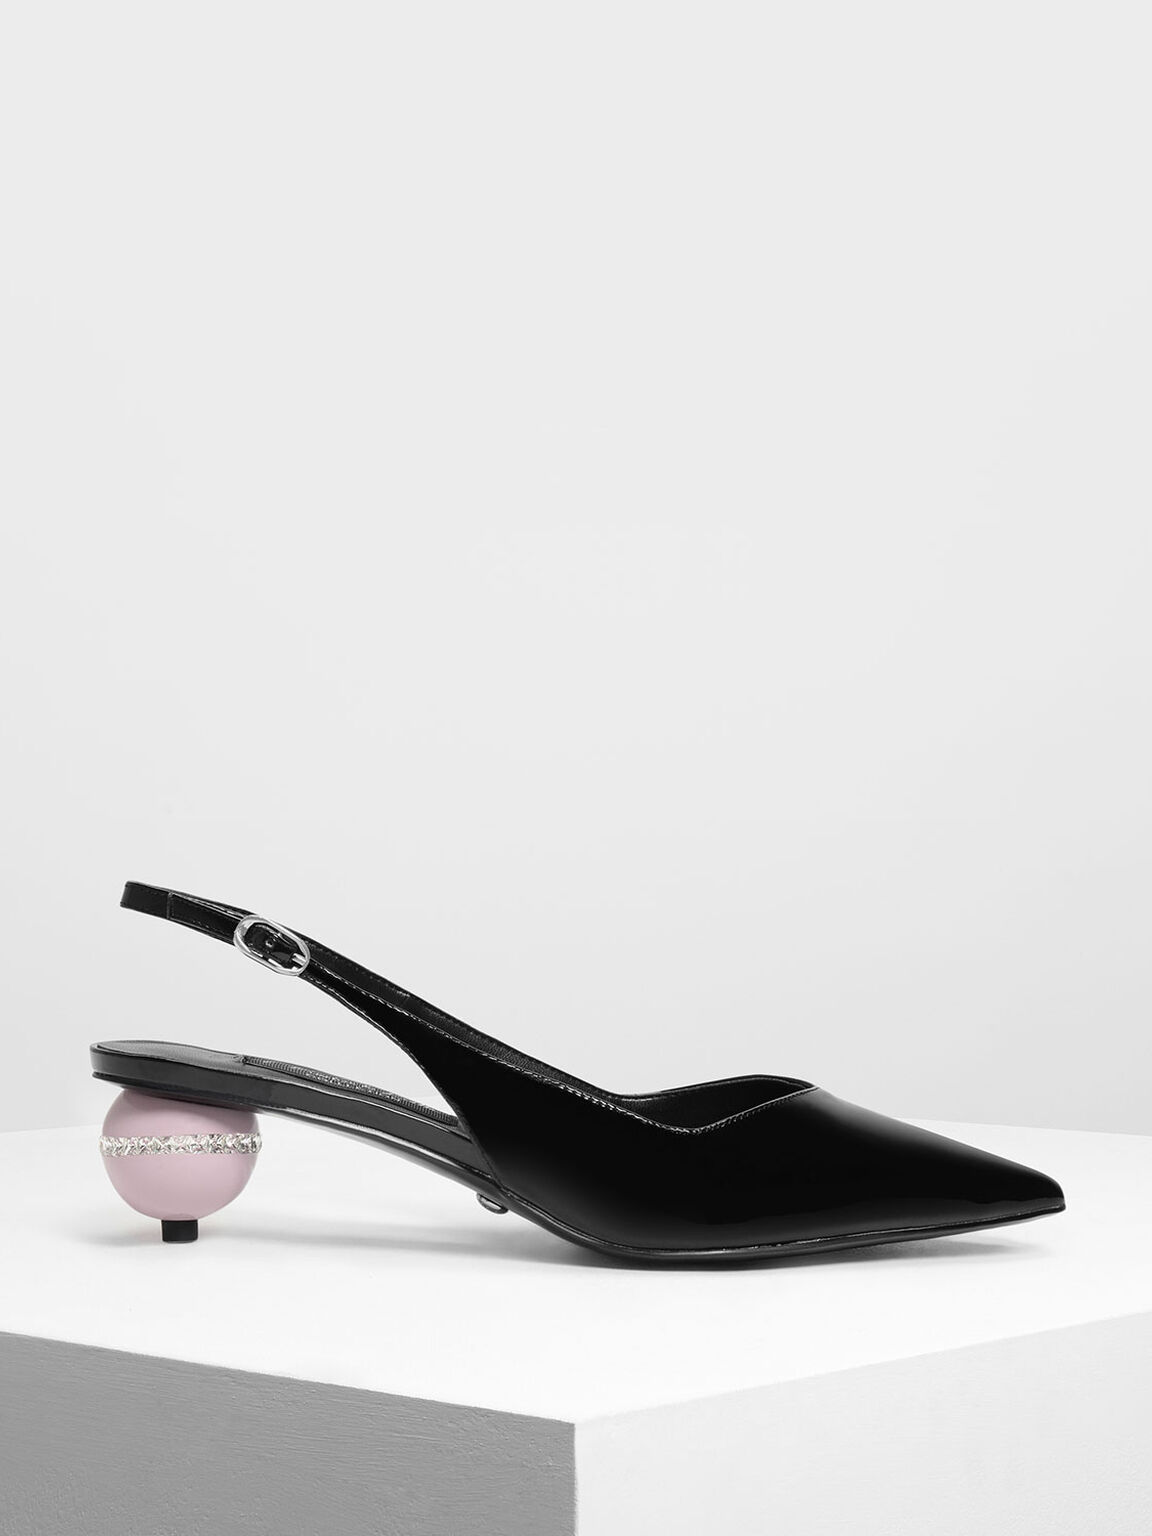 Leather Spherical Slingback Heels, Black, hi-res